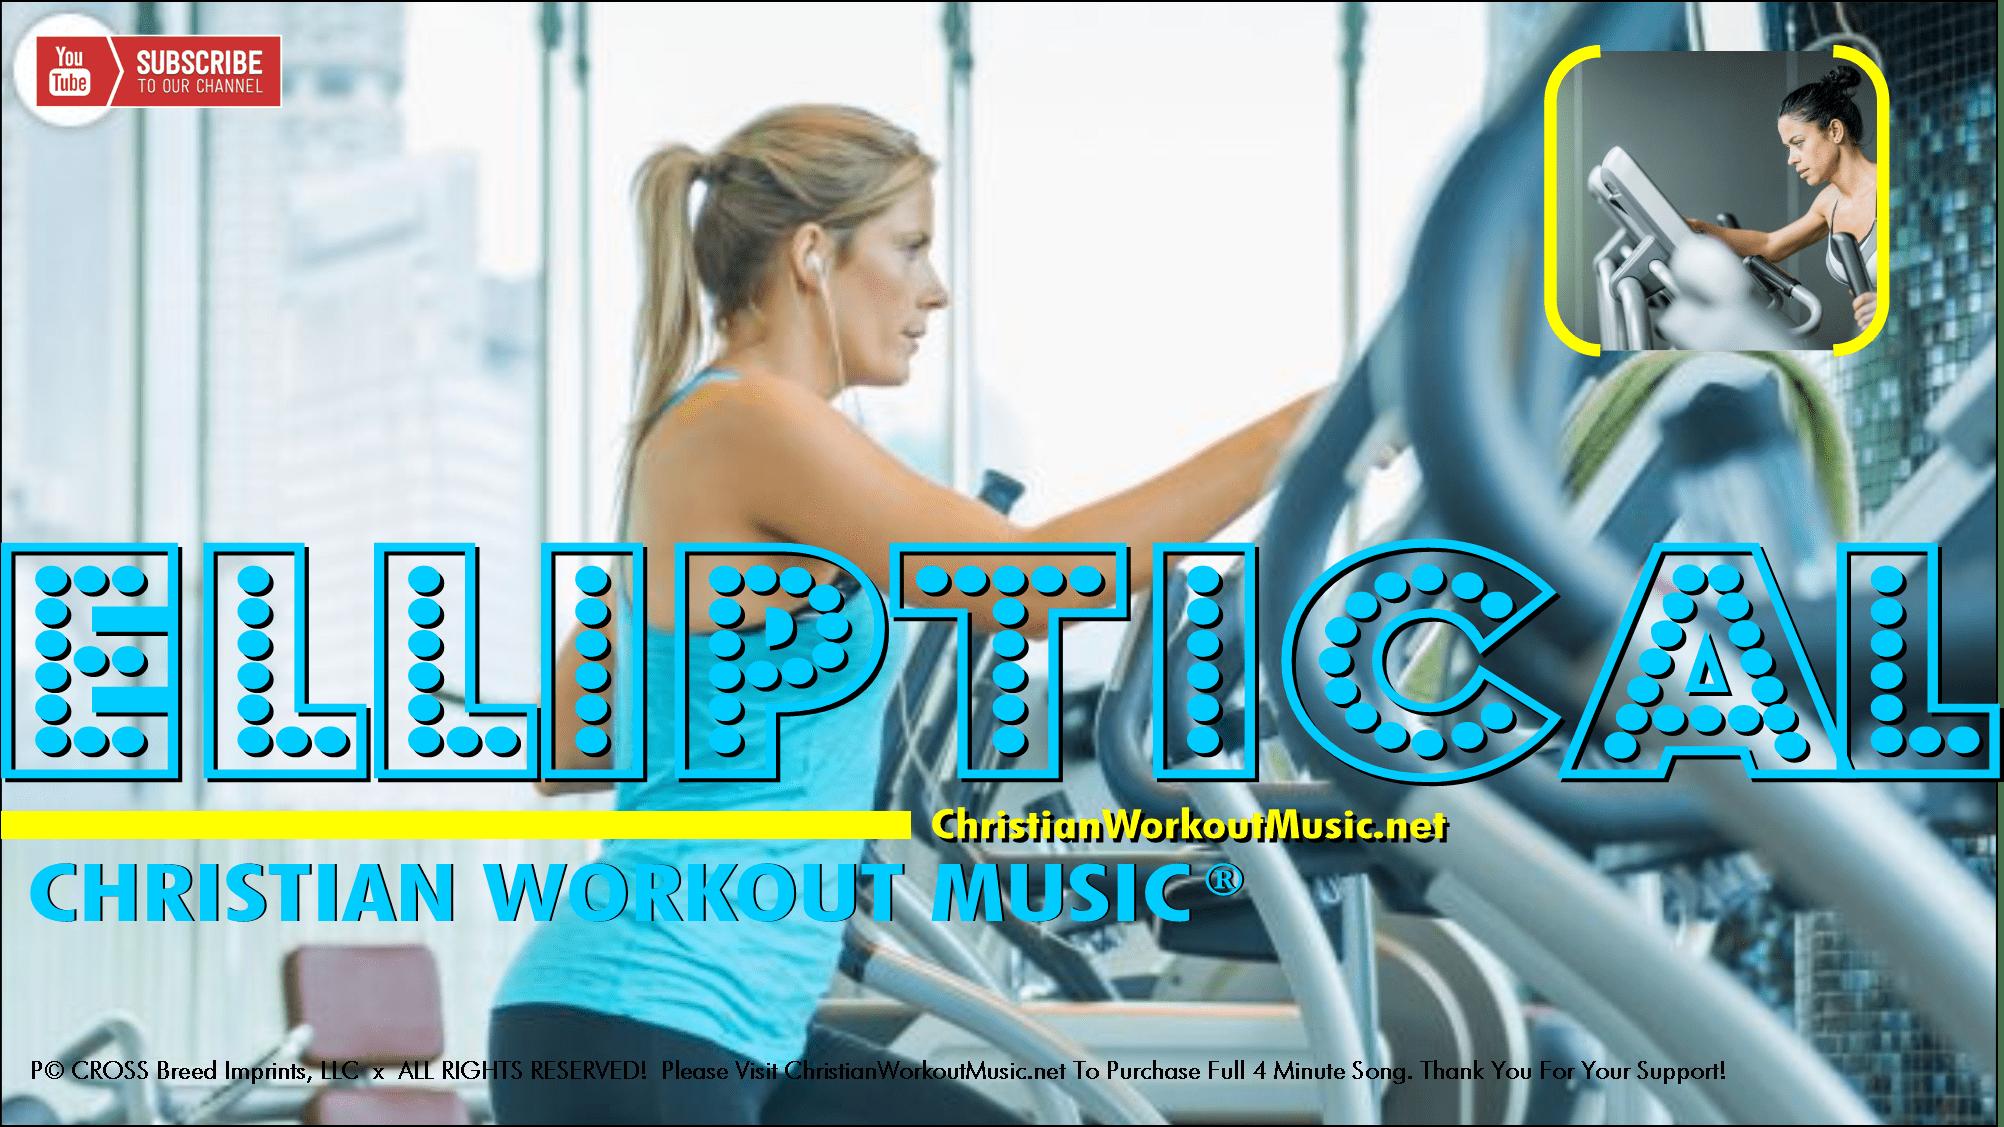 elliptical-exercise-elliptical-machine-thumbnail-christian-workout-music-vol-1